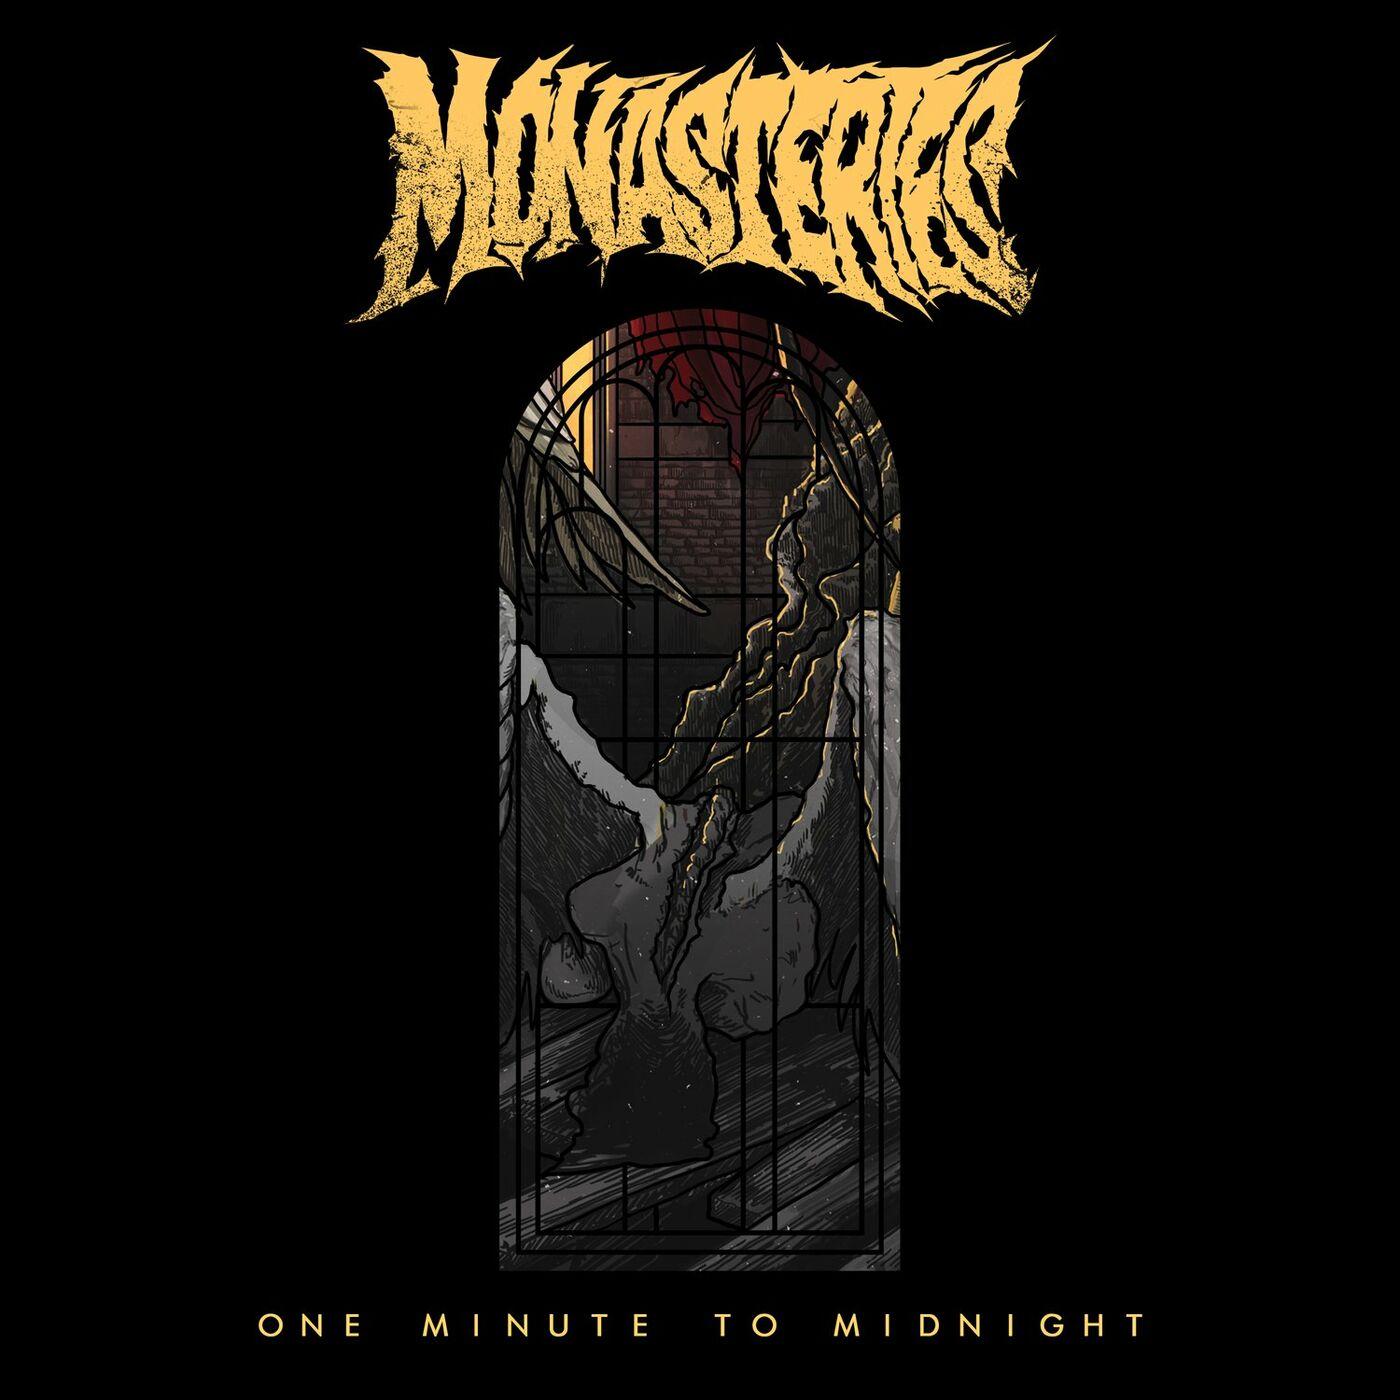 Monasteries - One Minute to Midnight [single] (2021)